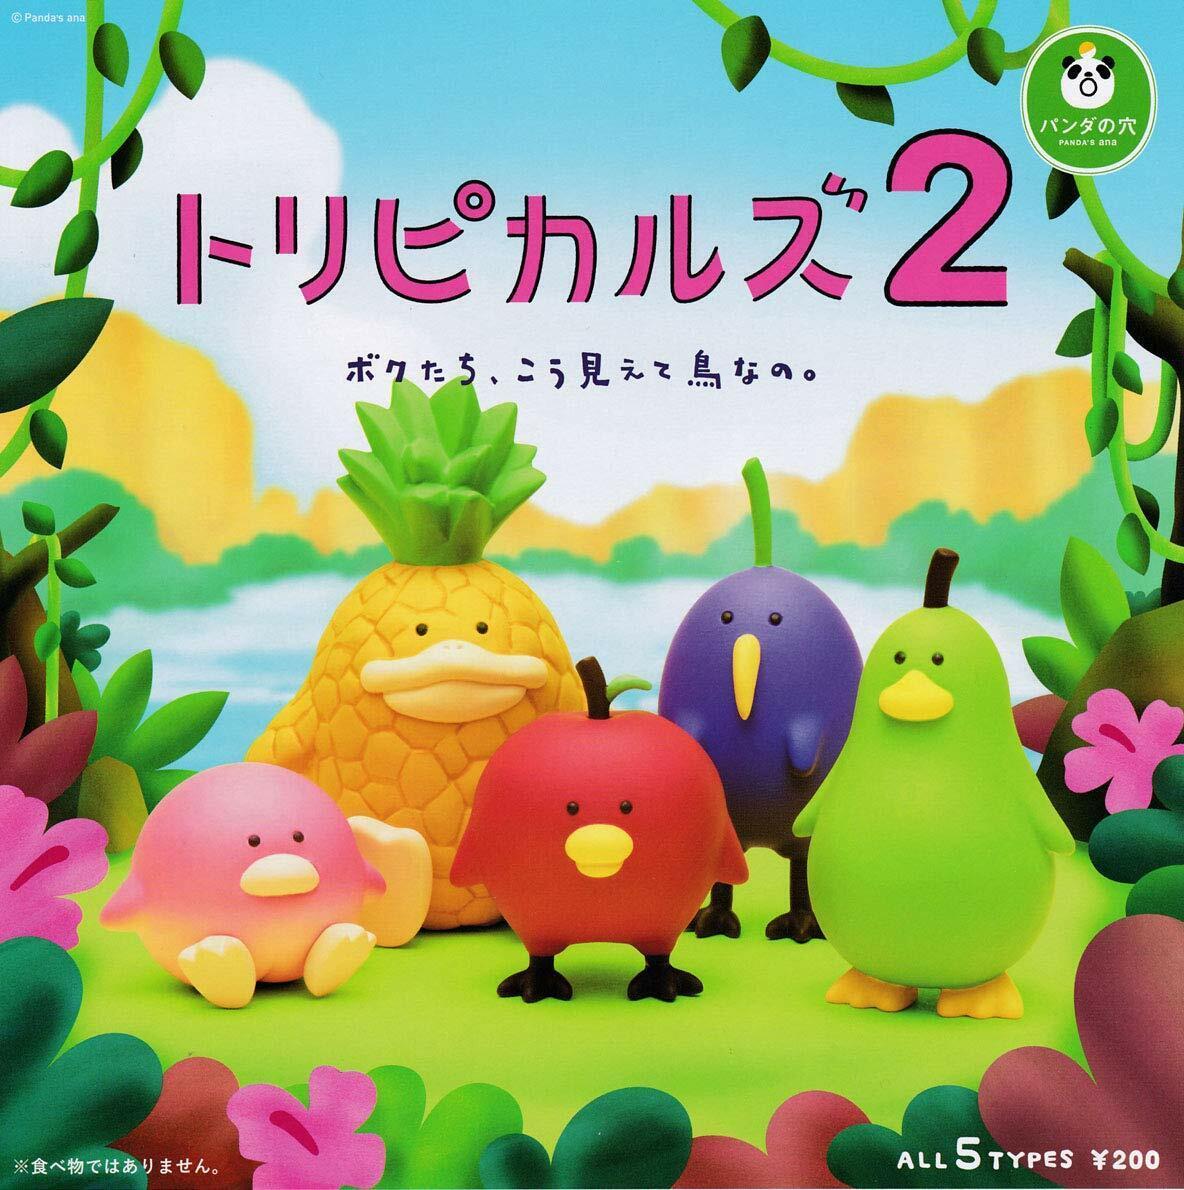 Panda/'s Hole Ana Ueki Street 2019 UEKIMACHI Gashapon Completed Set 5pcs Toys JP